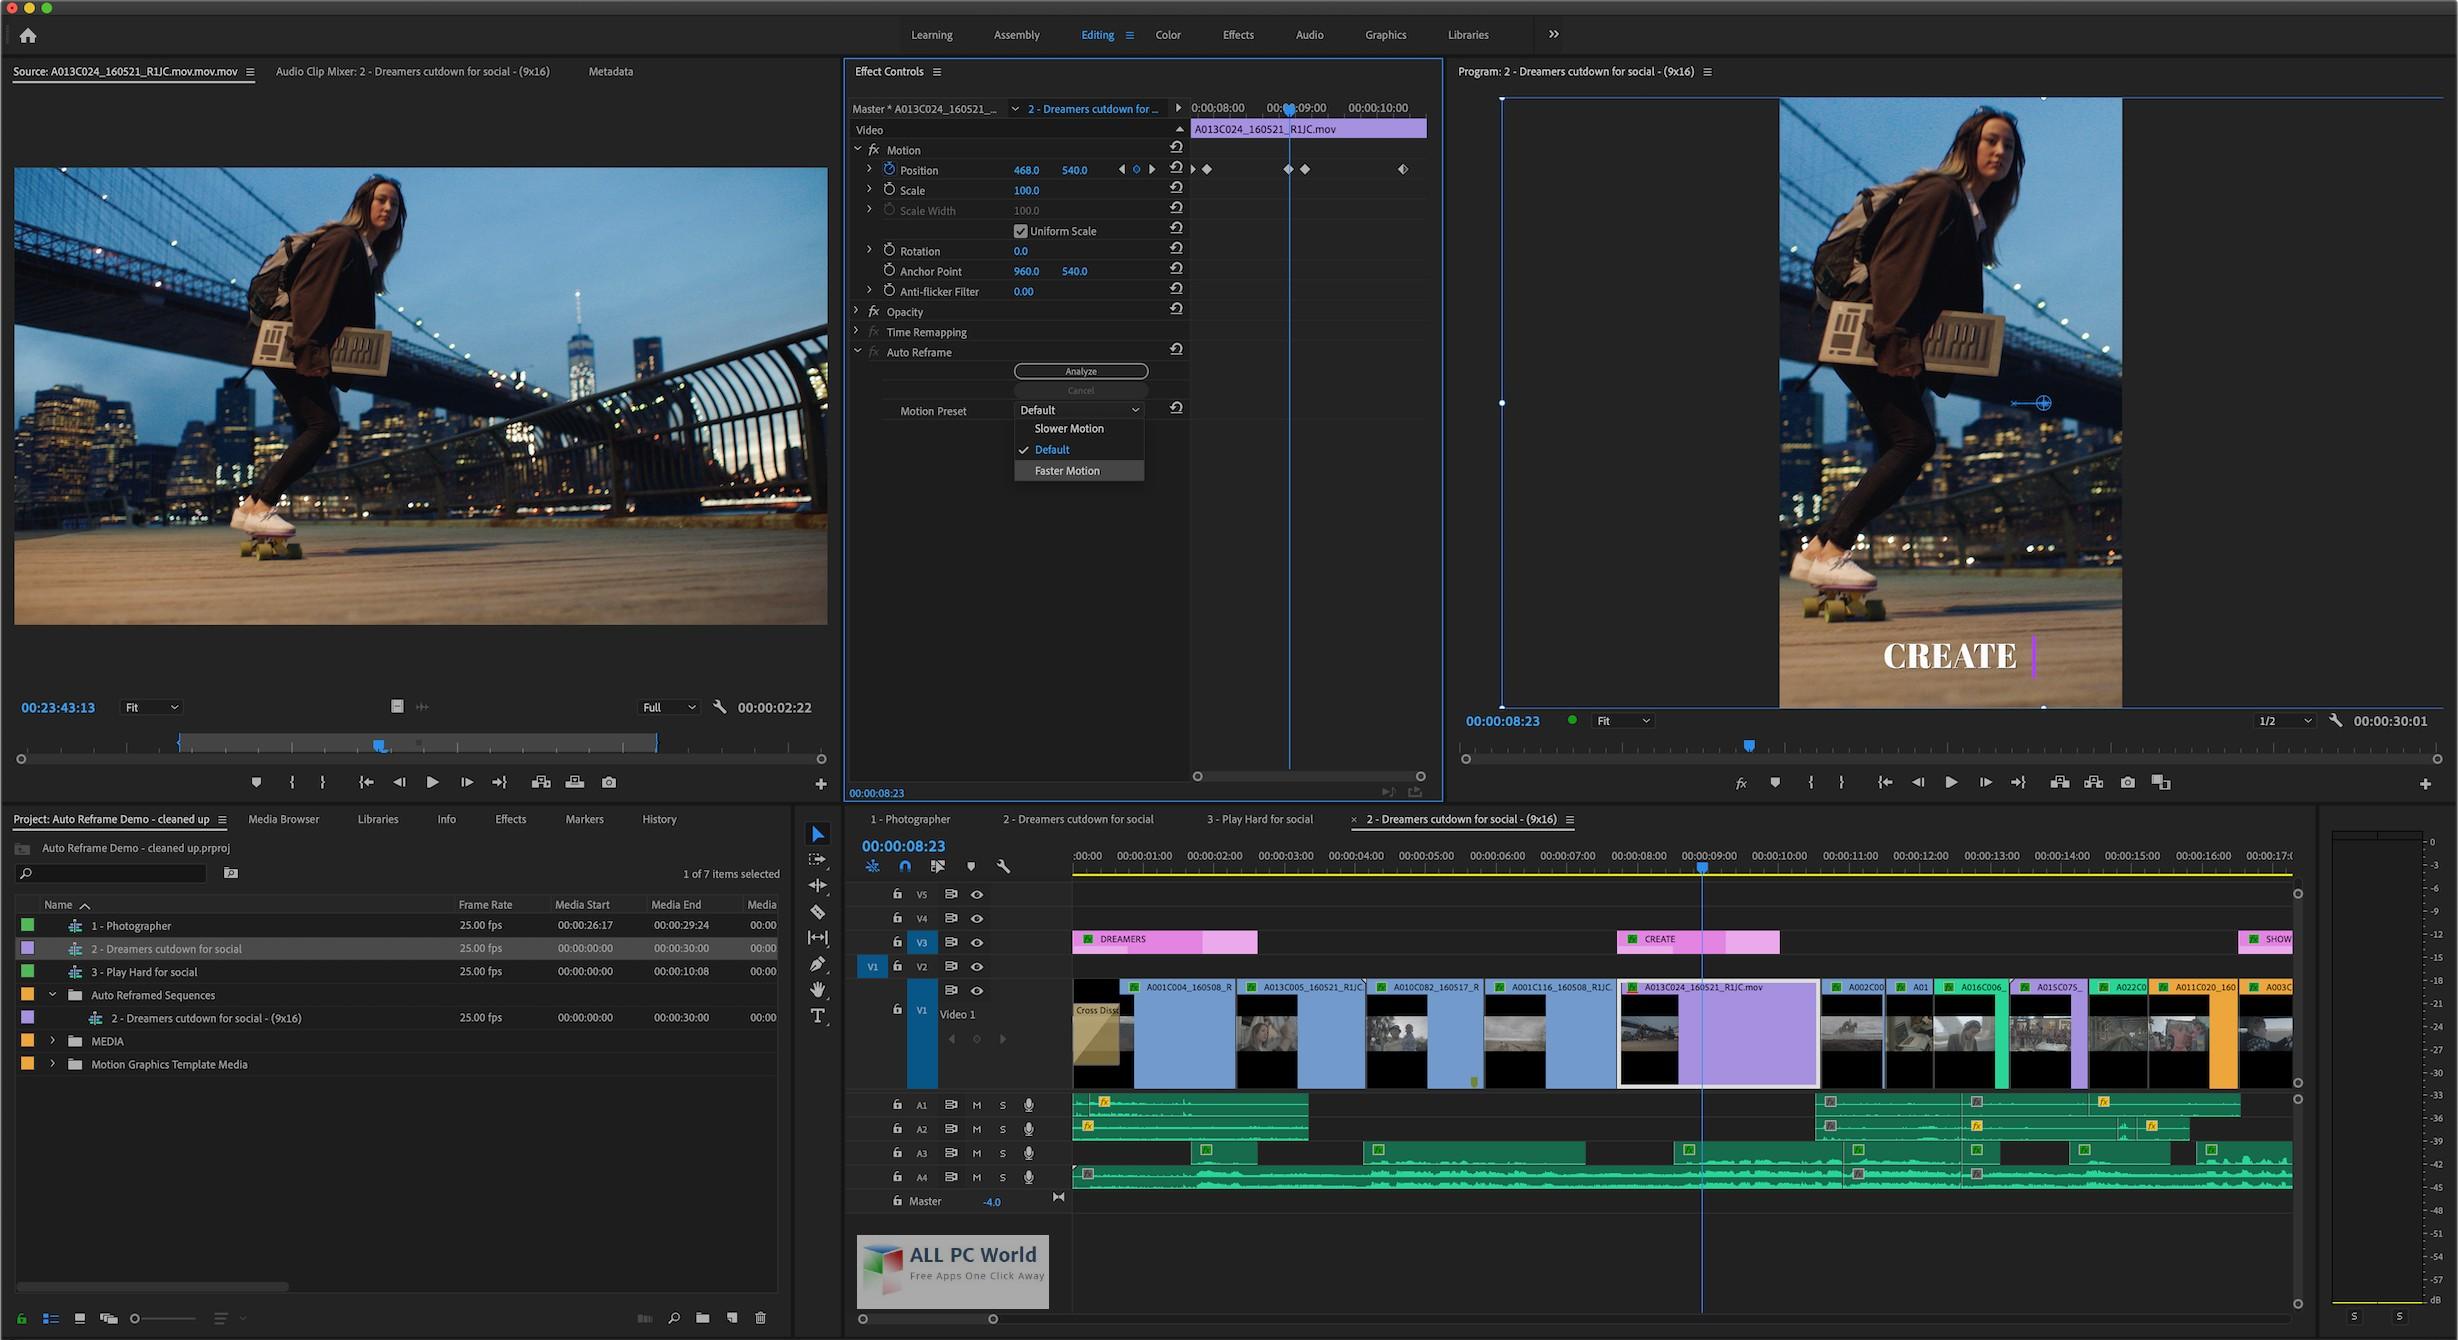 Adobe Media Encoder CC 2020 v14.0.1.70 Download